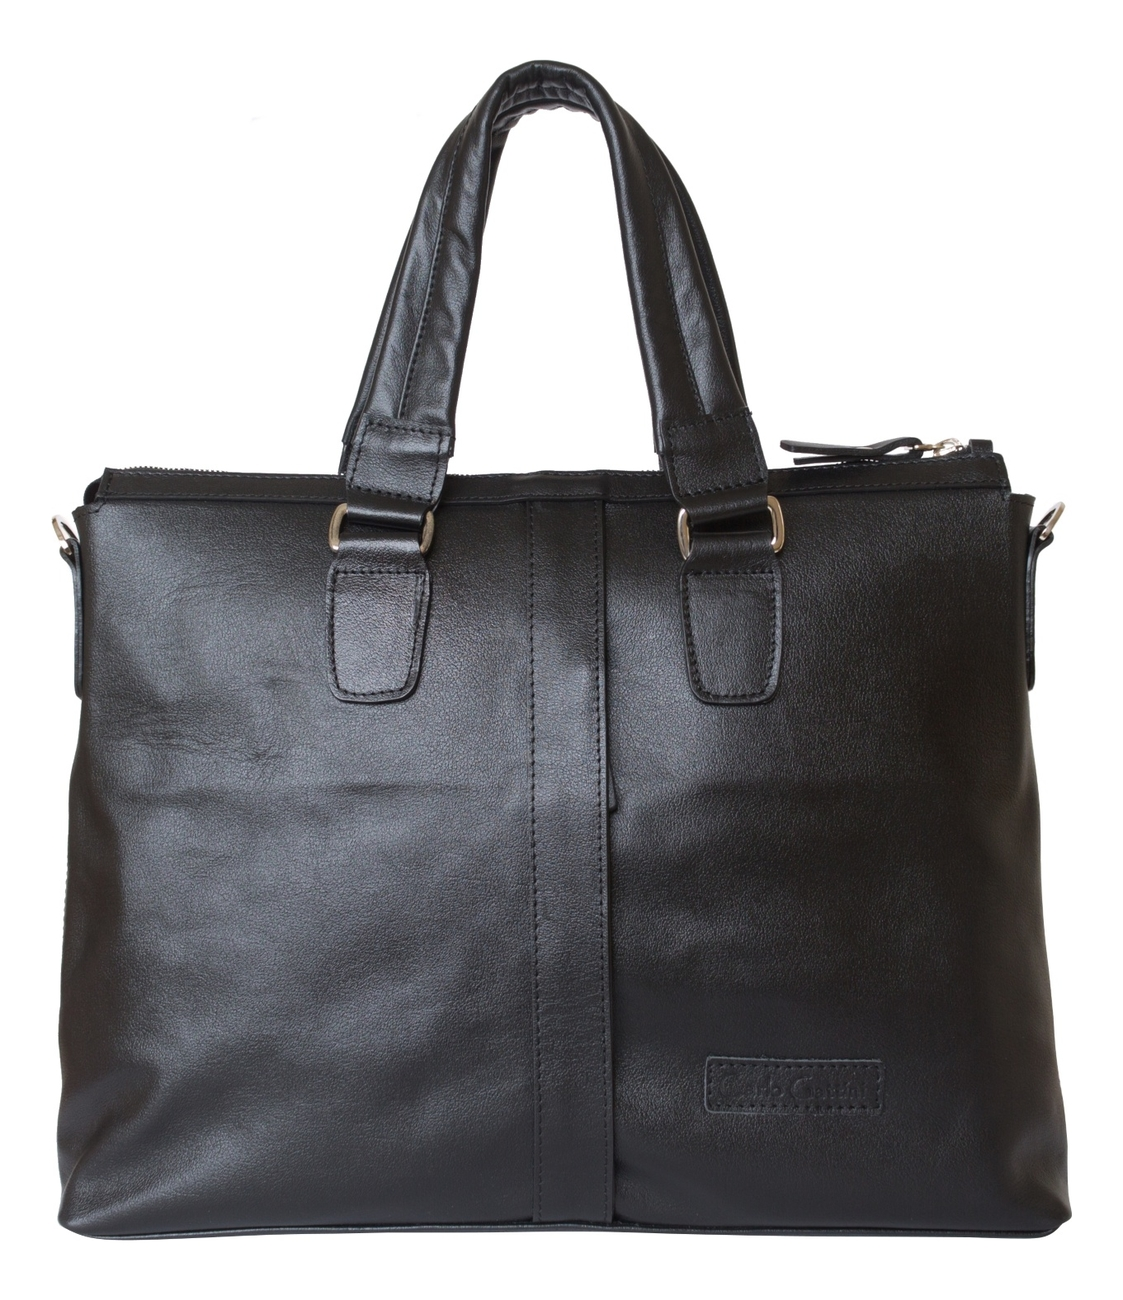 Сумка Cimetta Black 5018-01 сумка carlo gattini carlo gattini mp002xm0lzot